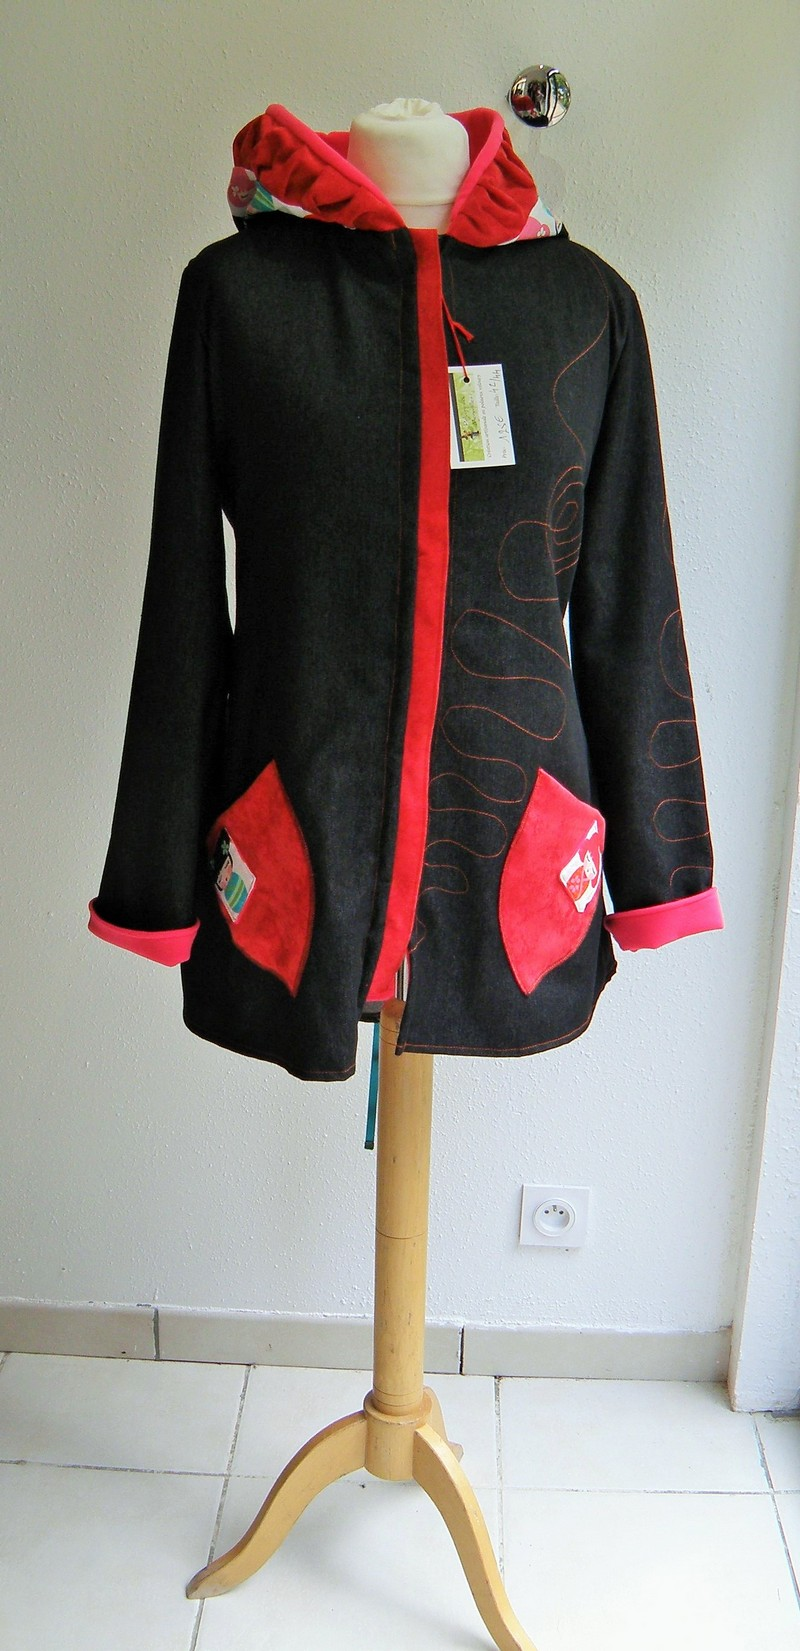 Veste jean lutin doublée micro pink + coton poupée chinoise fond blanc 42/44-5166